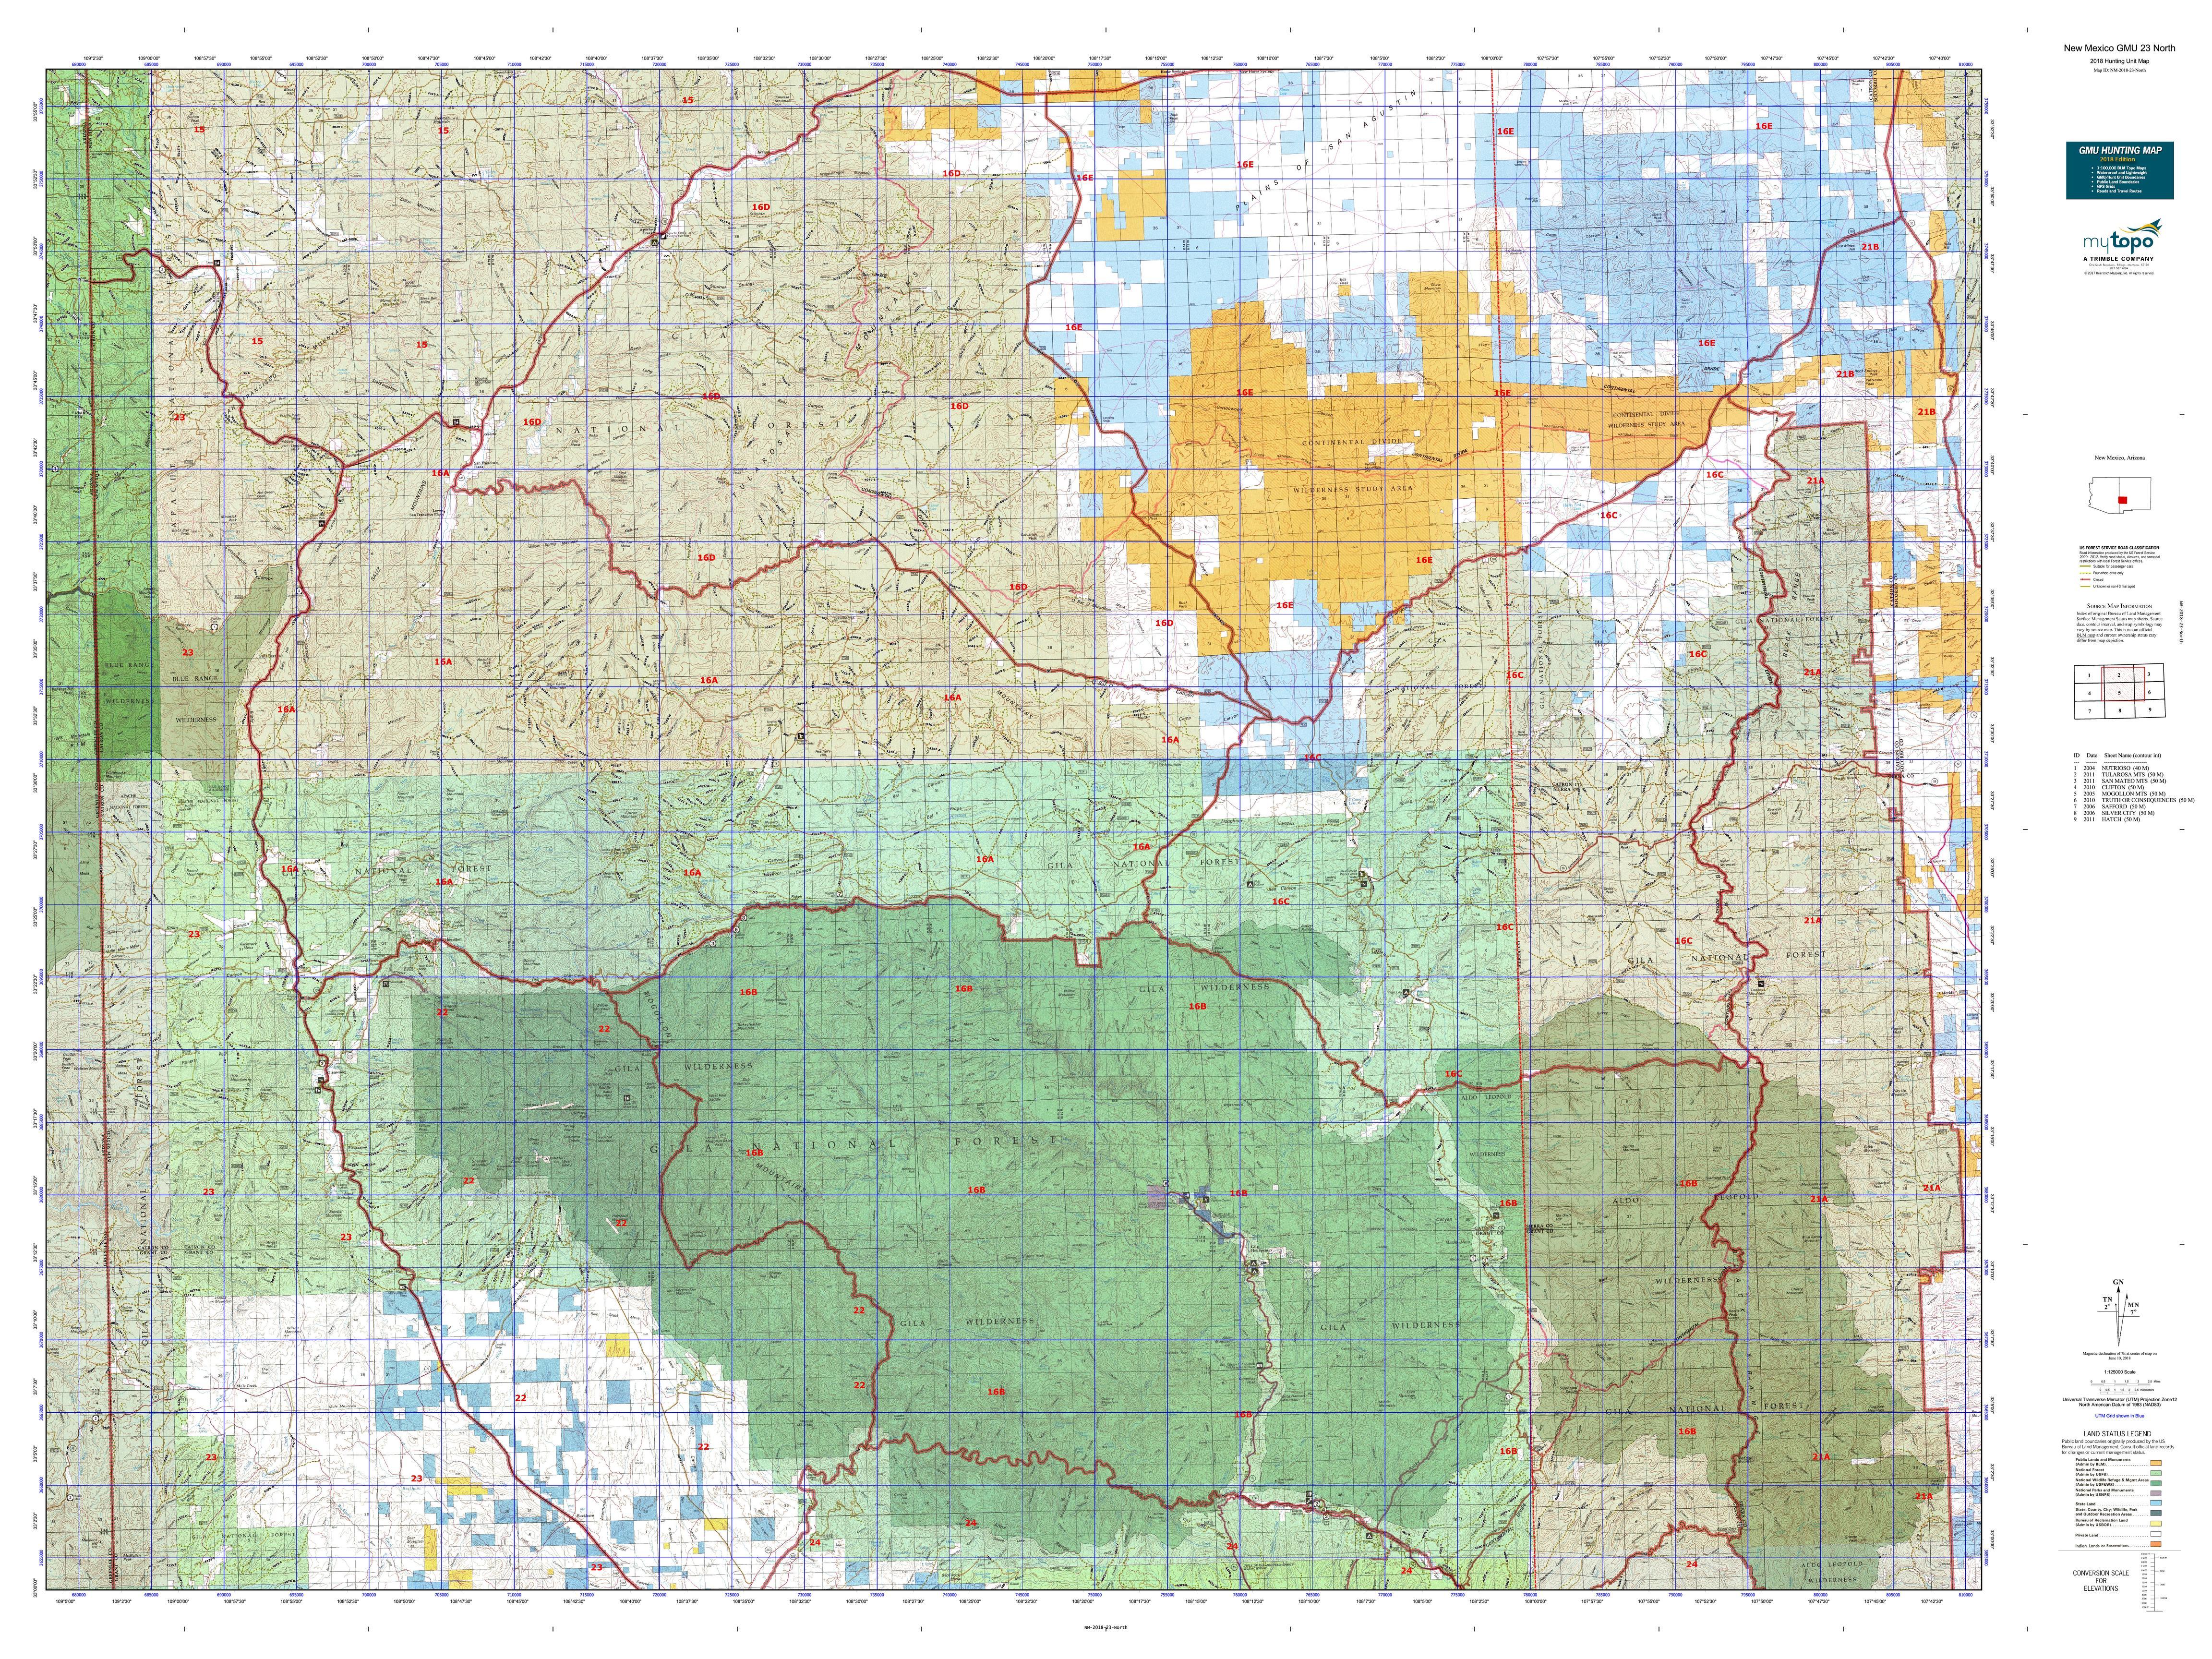 North New Mexico Map.New Mexico Gmu 23 North Map Mytopo